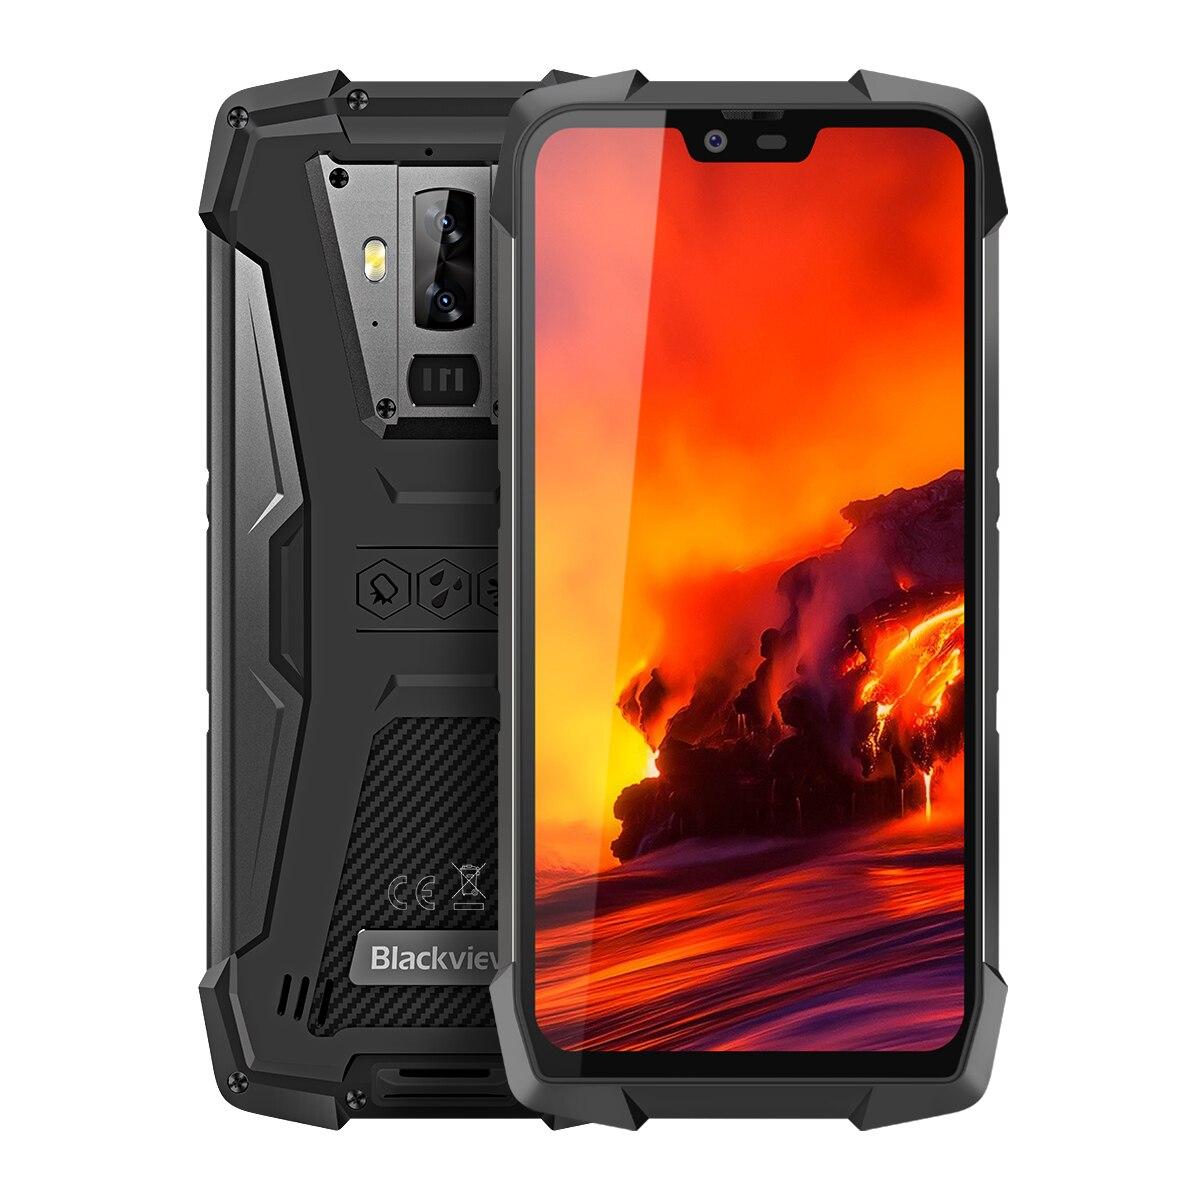 Téléphone portable robuste Blackview BV9700 Pro IP68/IP69K Helio P70 Octa core 6 GB + 128 GB 5.84